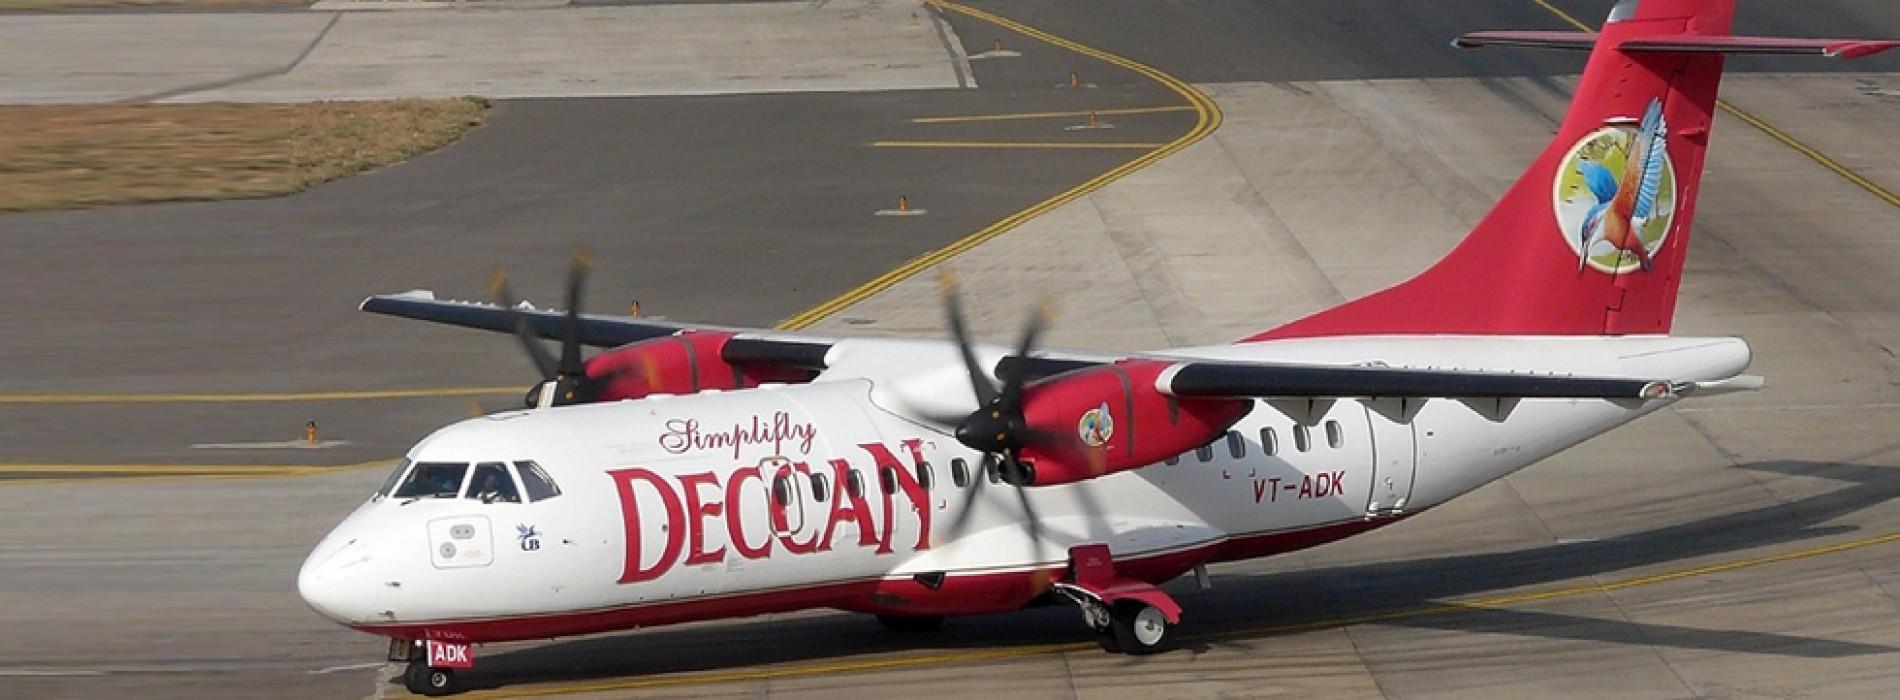 Air Deccan takes wings again, flies to Jalgaon